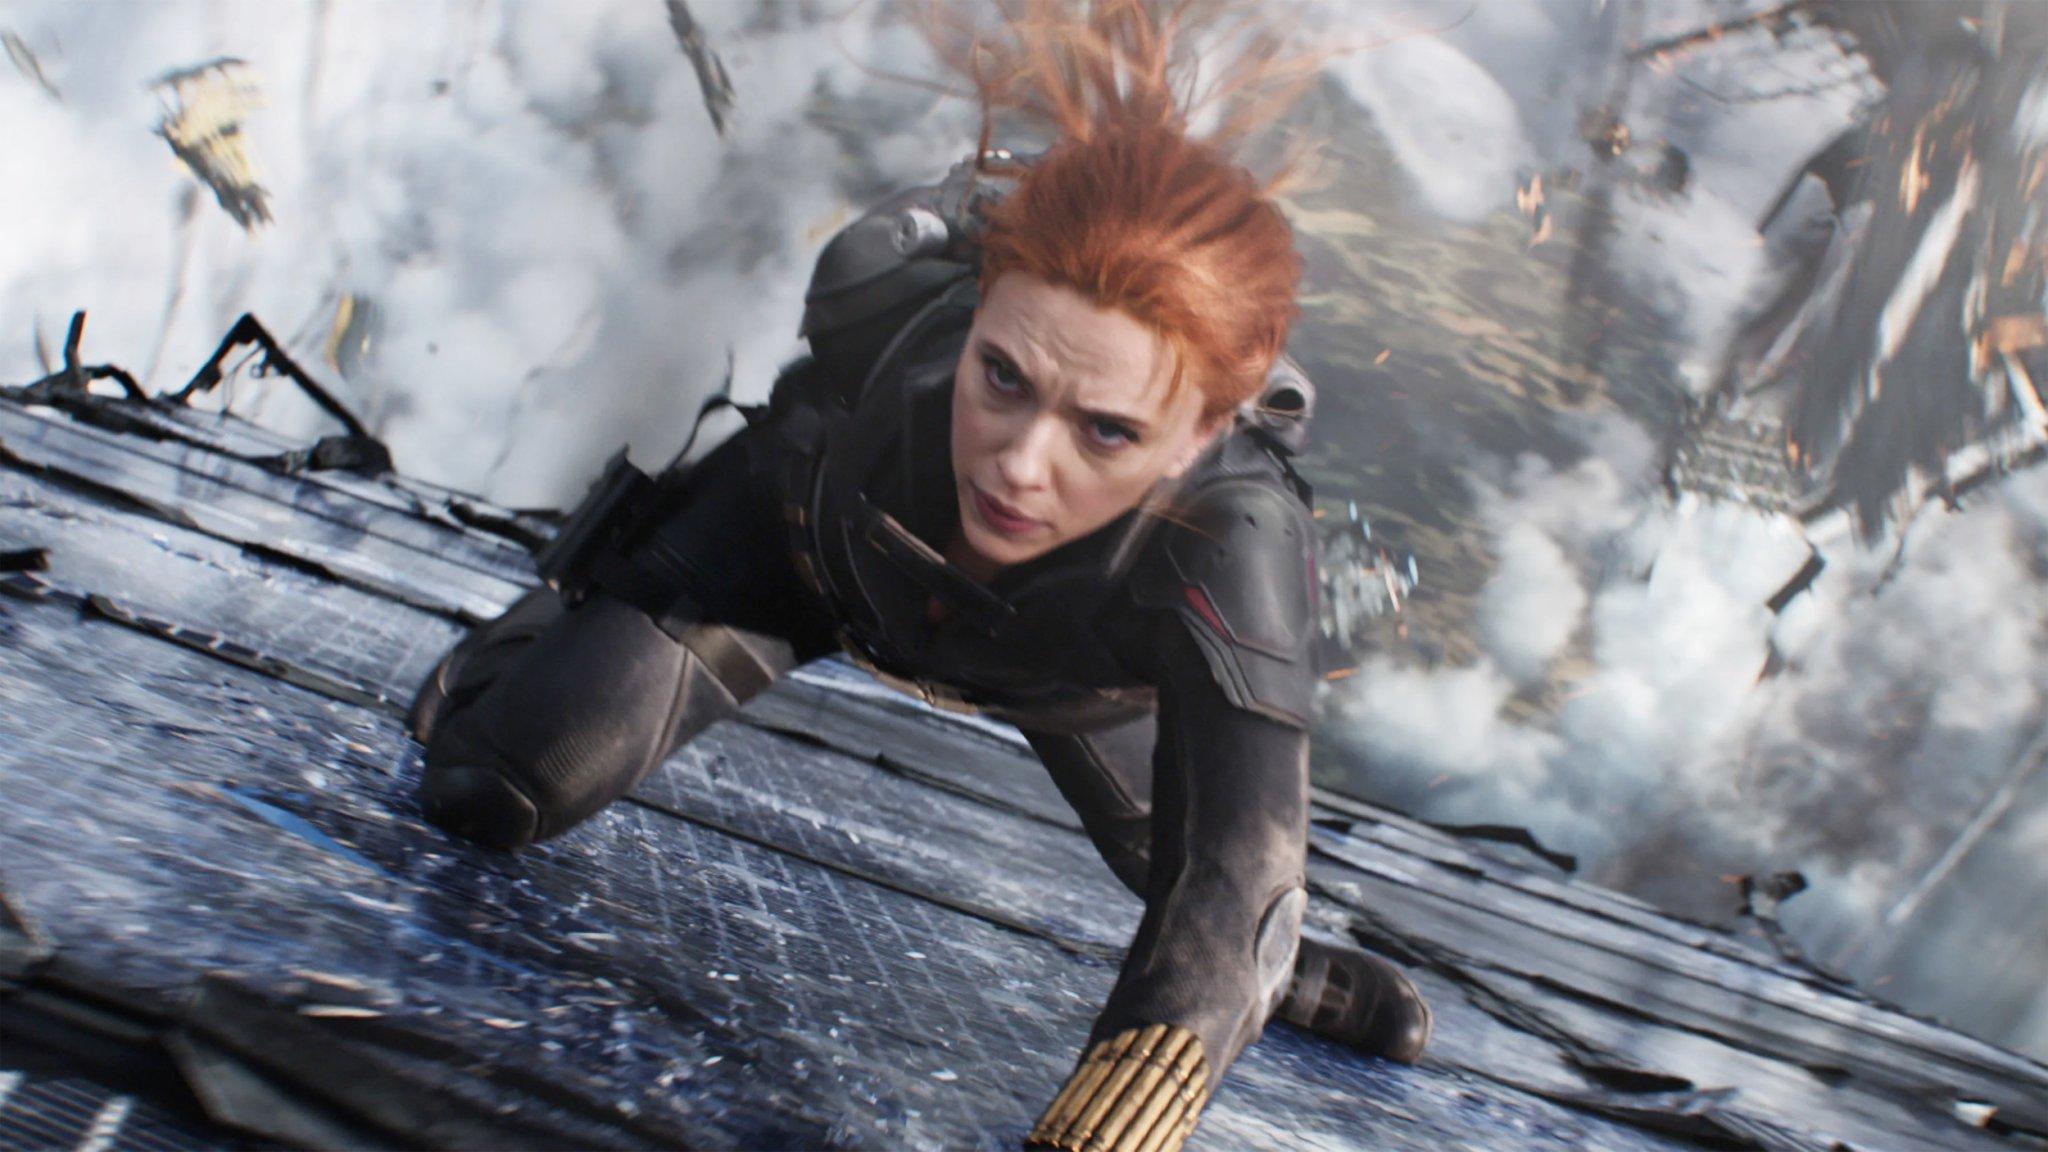 'Black Widow' helps Disney collect $125 million in online revenue